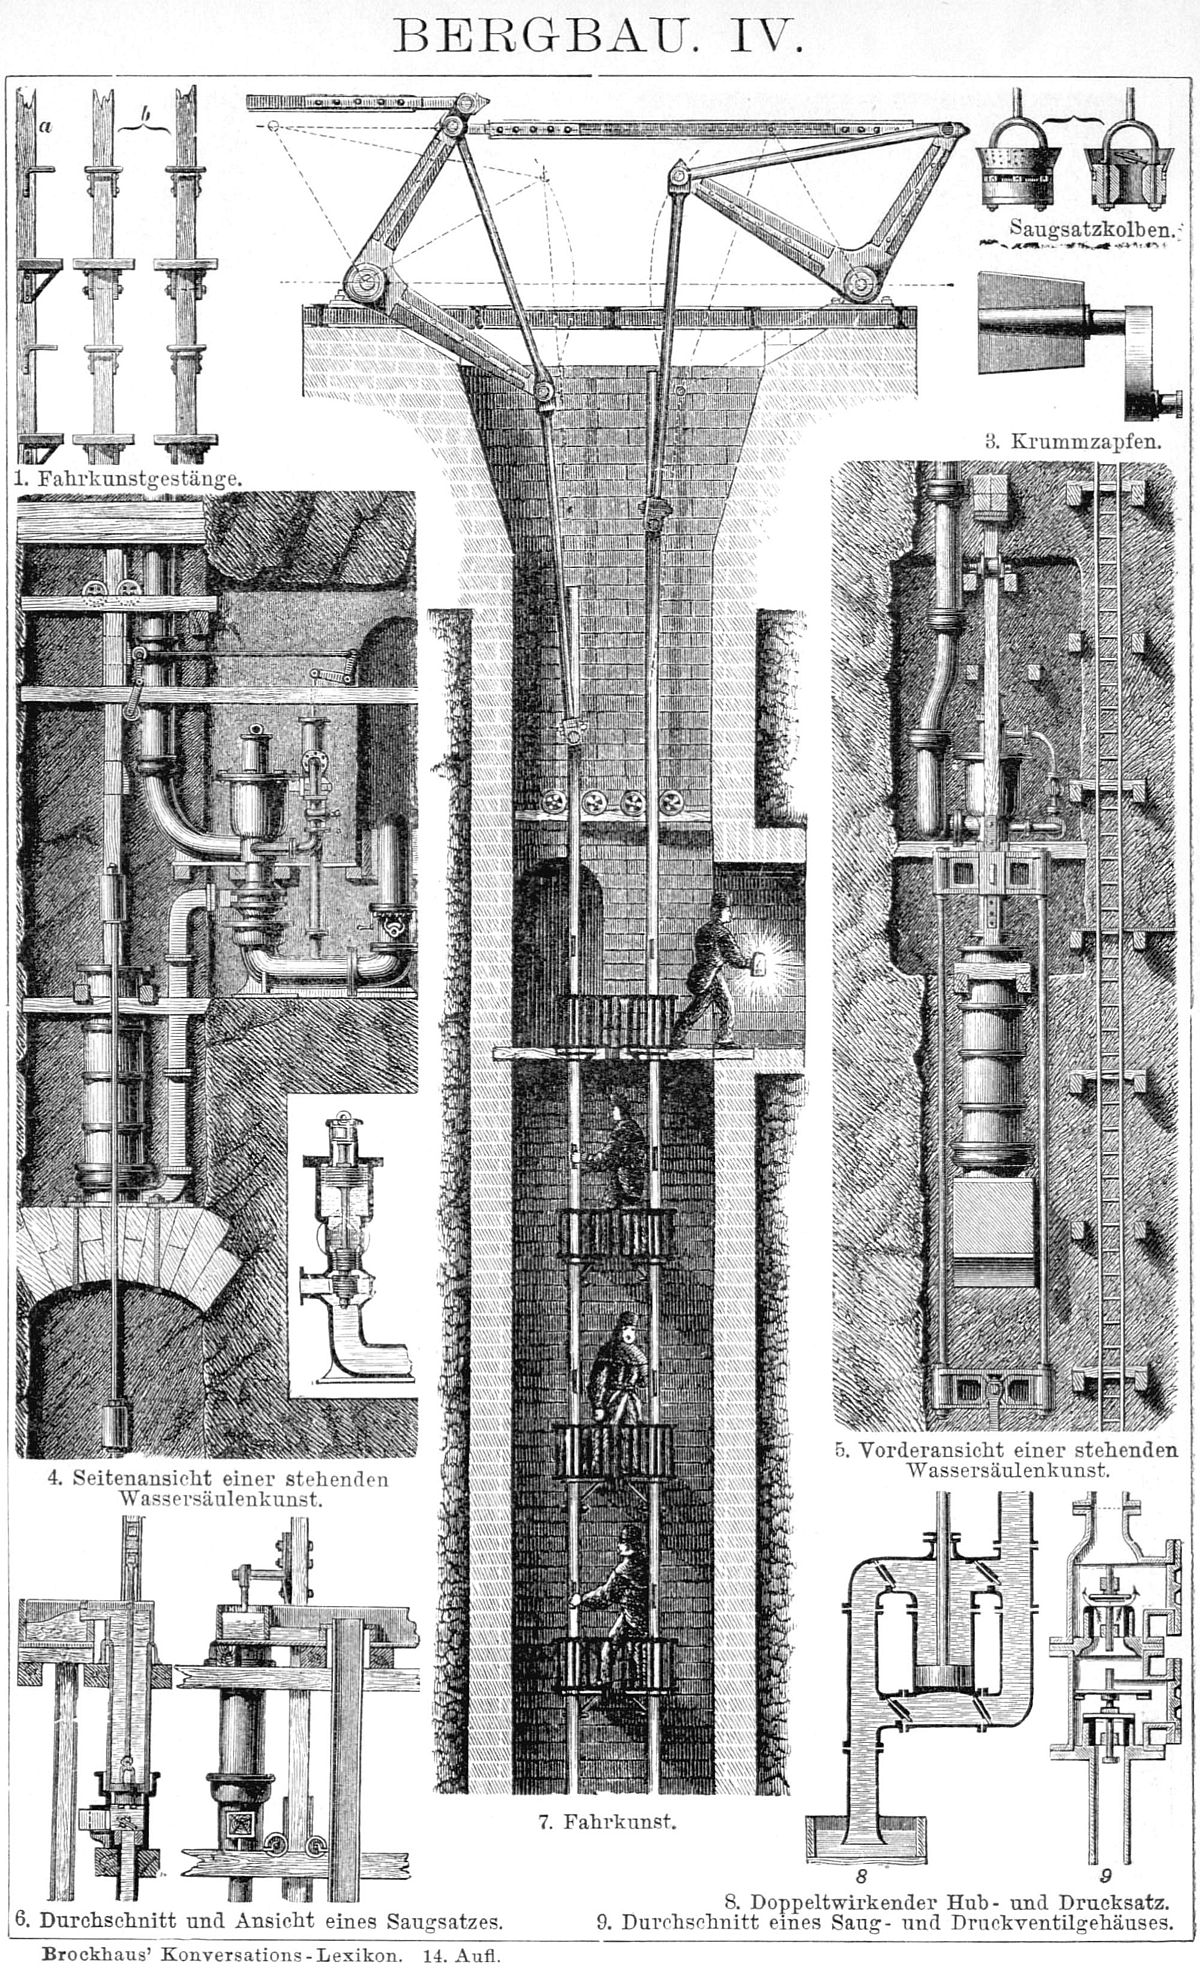 Wassers ulenmaschine wikipedia for Ingenieur bergbau